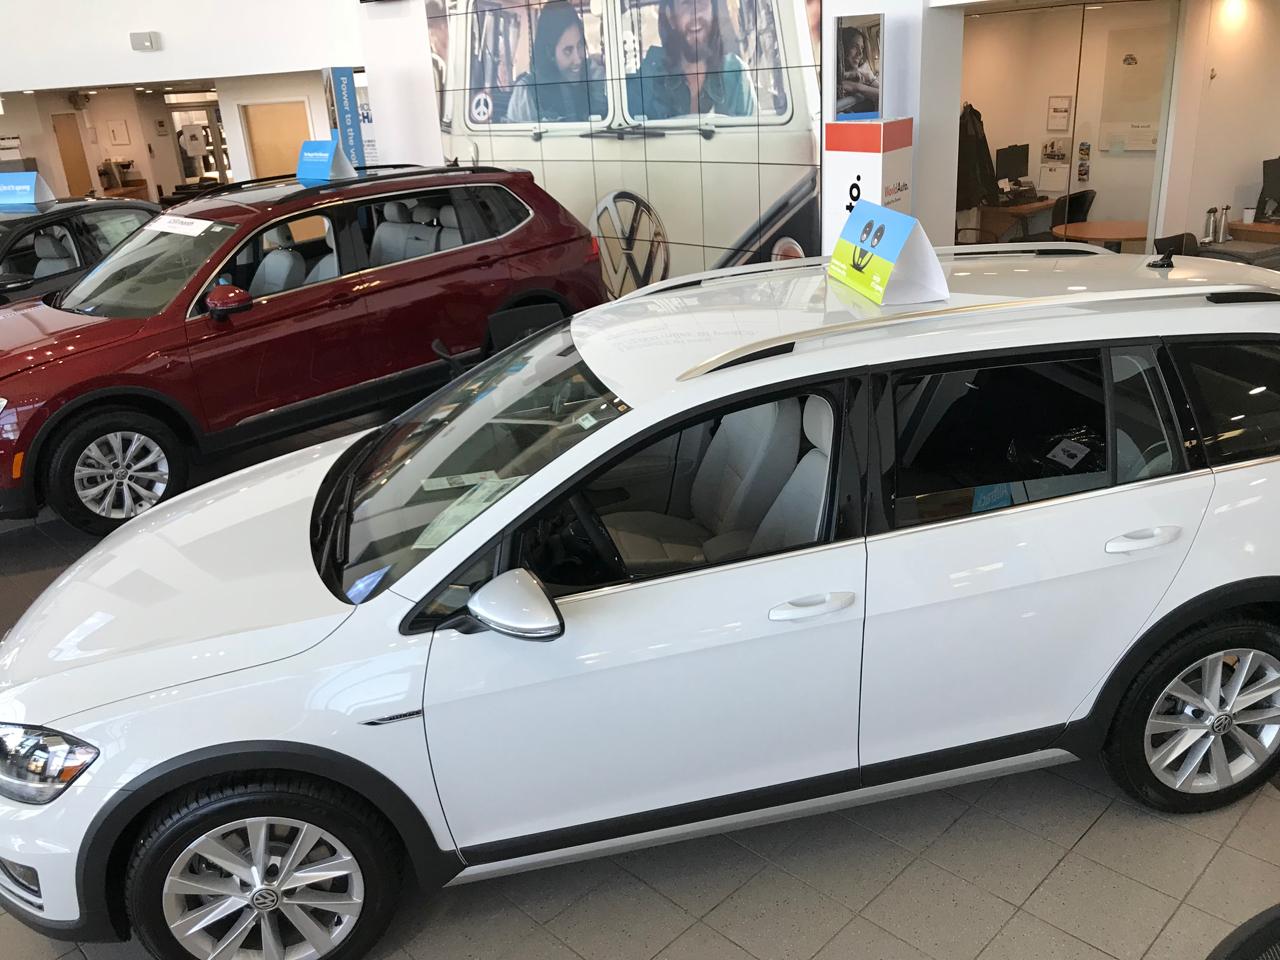 VW on the showroom floor of Emich VW in Denver